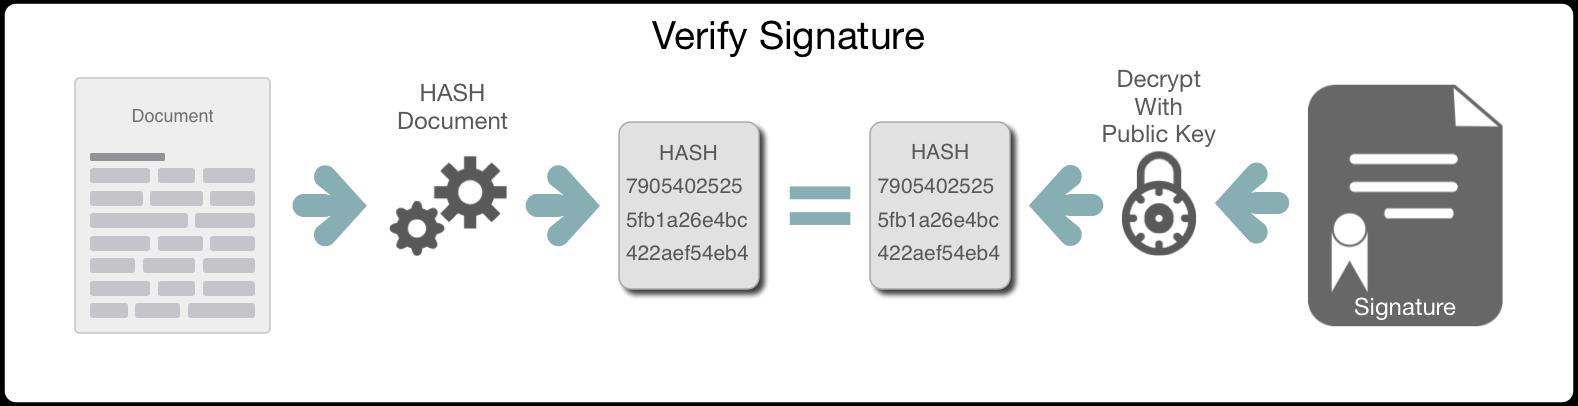 Verifying of a Signature